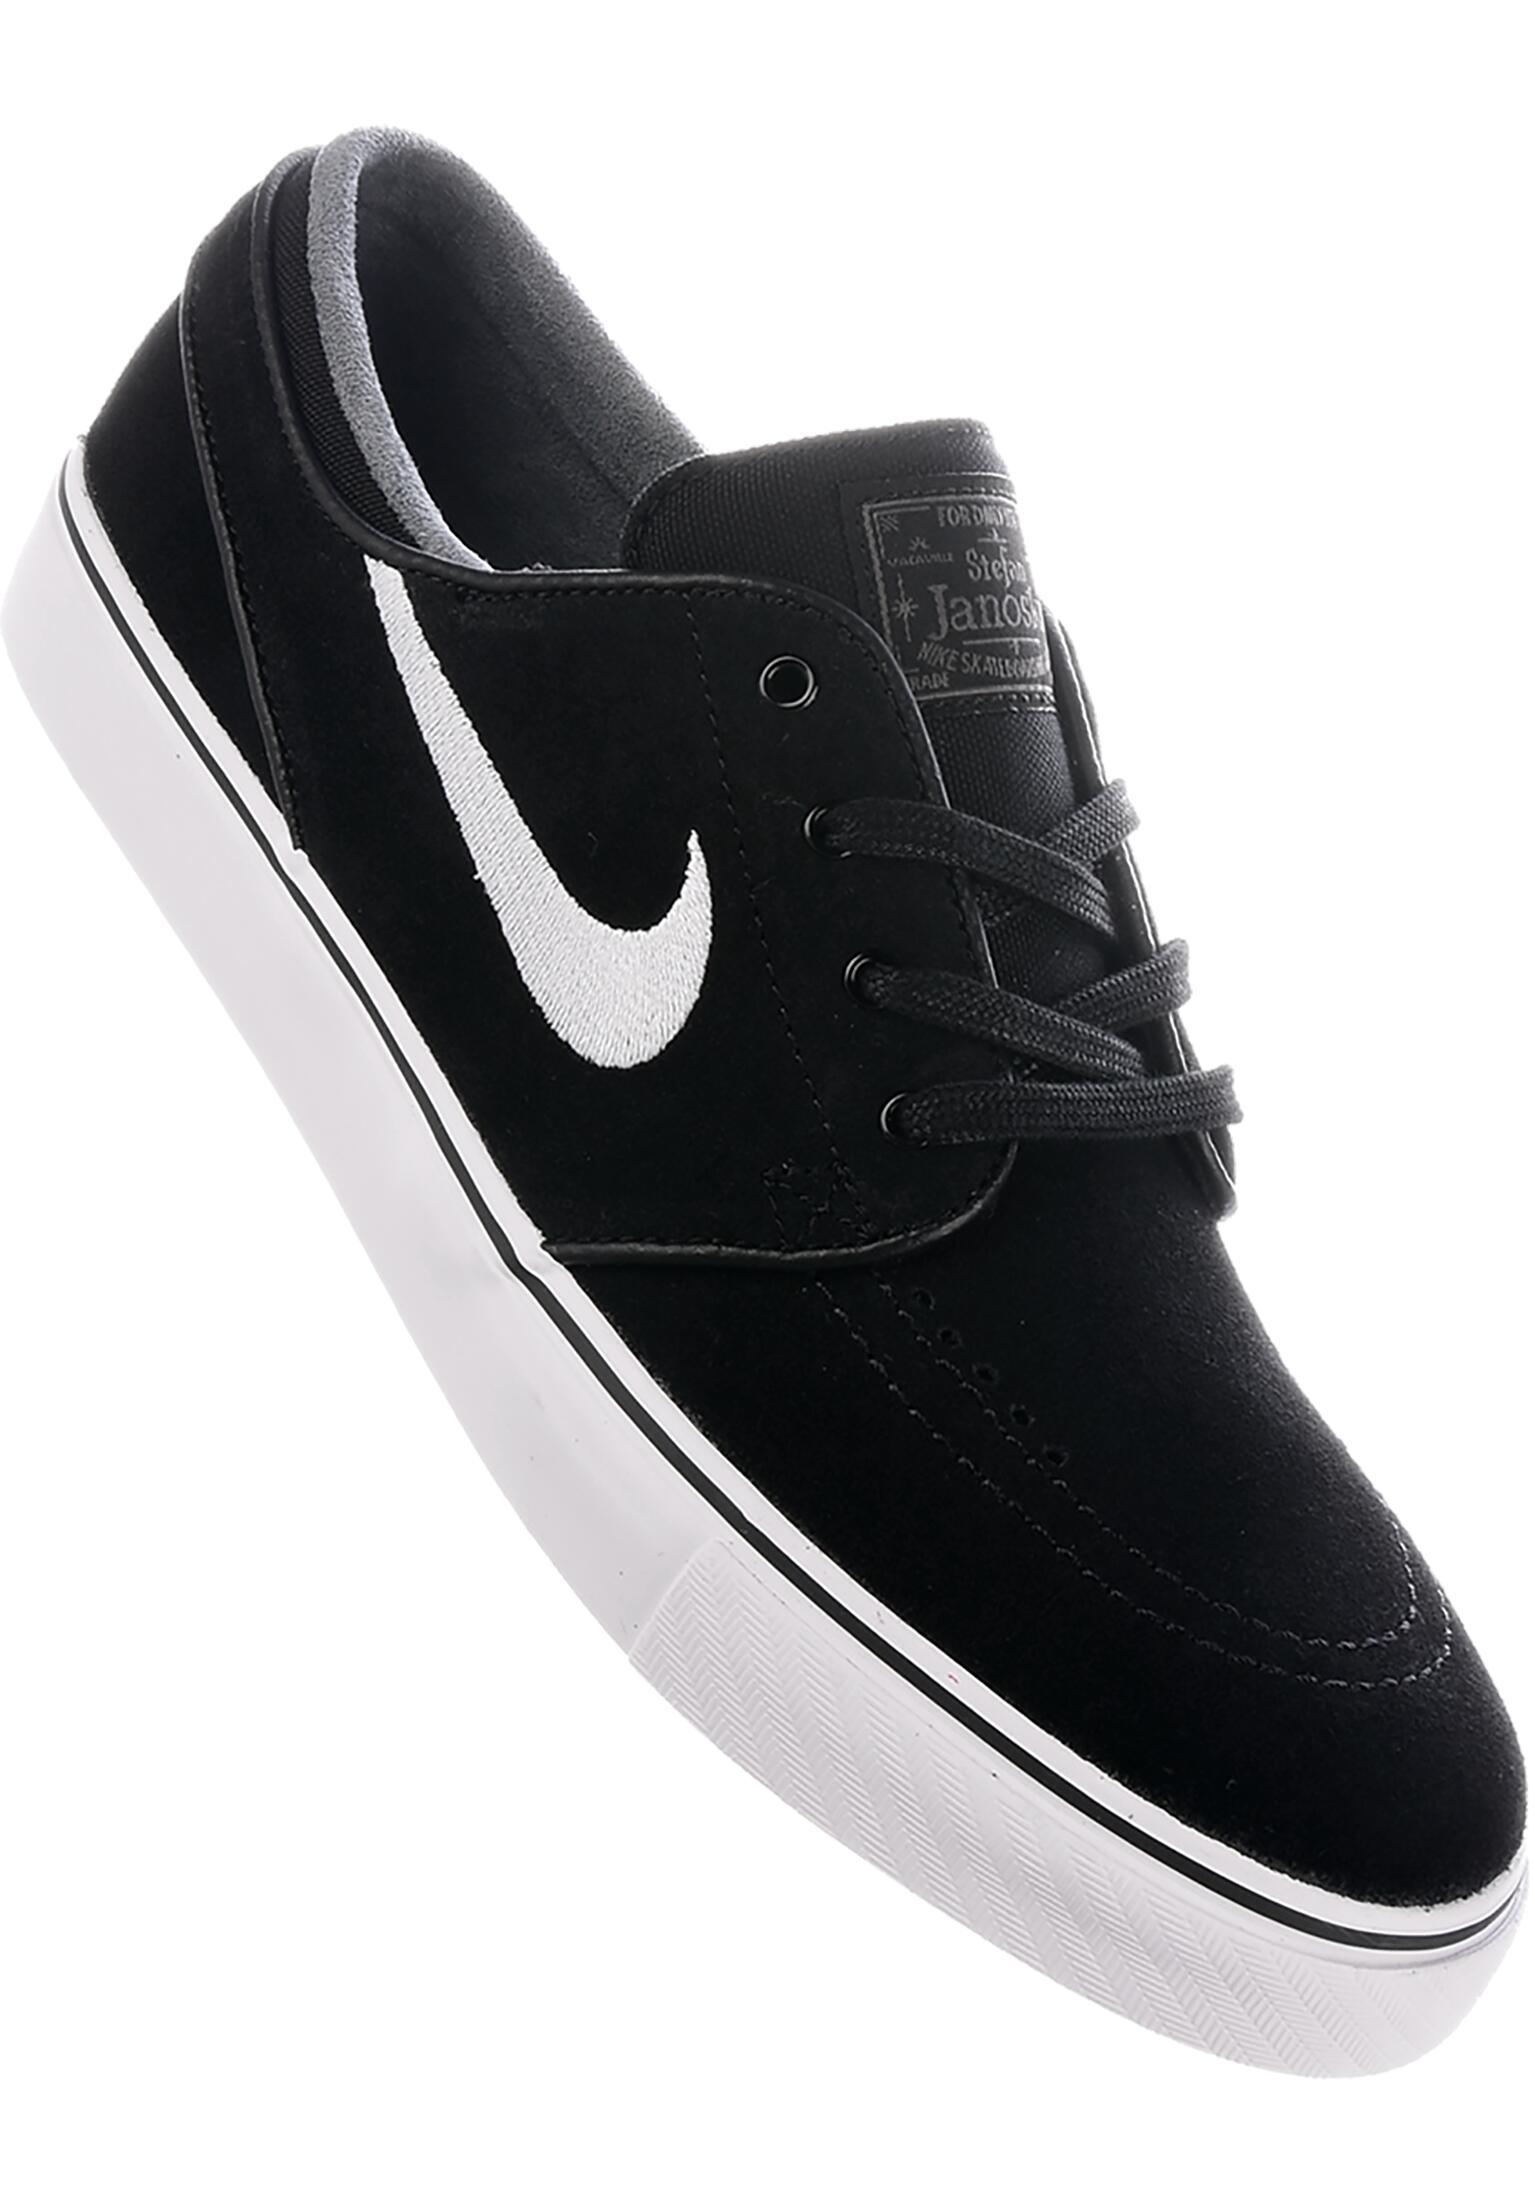 93f1fb0d9c4 Zoom Stefan Janoski Nike SB Alle Schuhe in black-white-thundergrey für  Herren